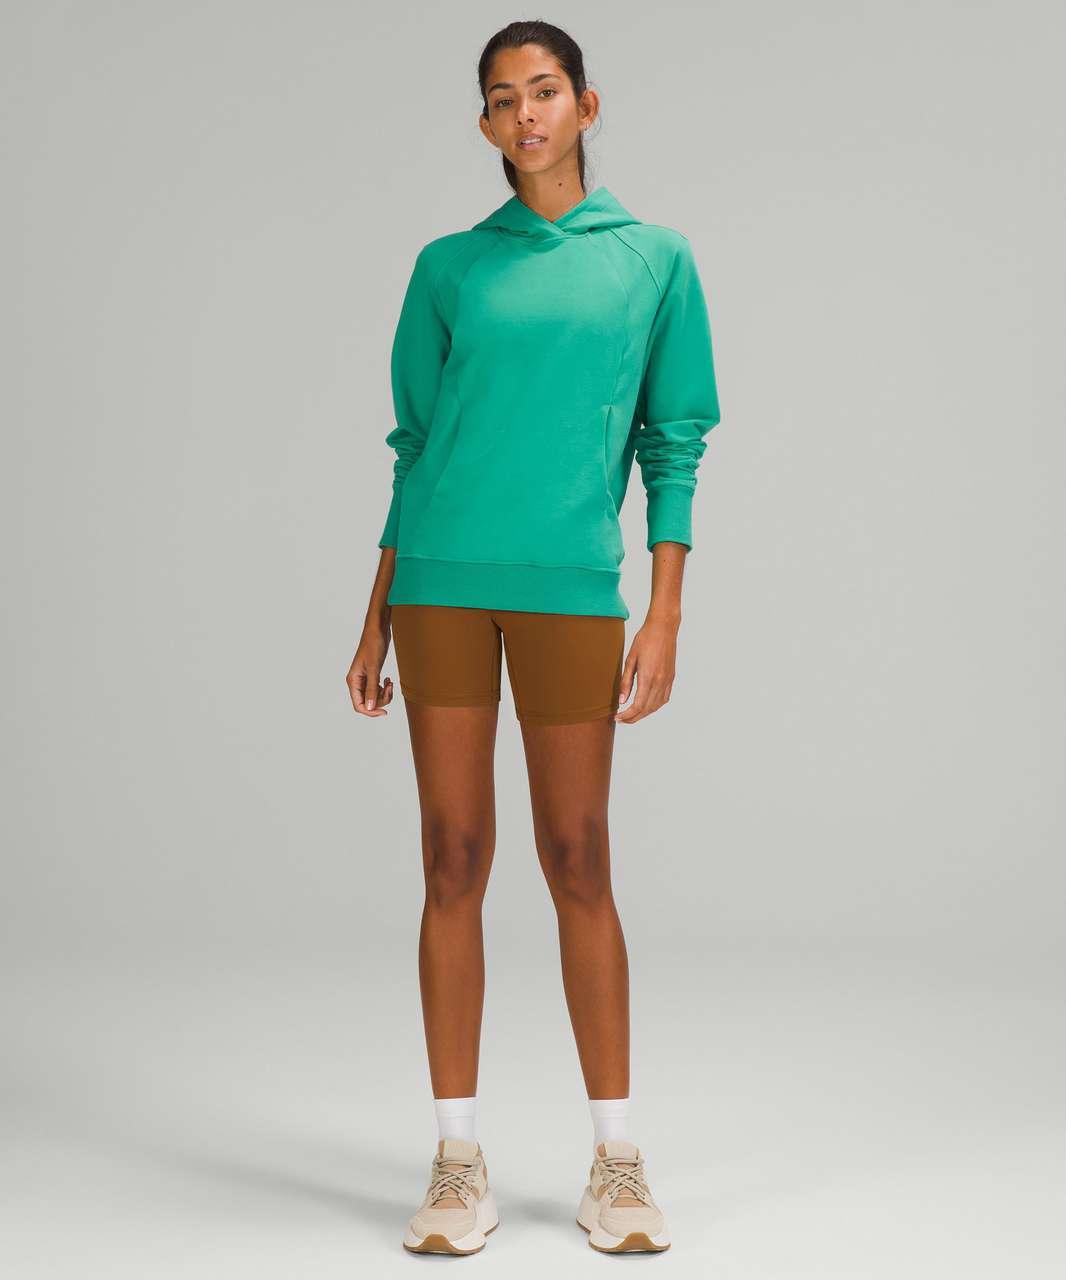 Lululemon Scuba Pullover Hoodie - Maldives Green